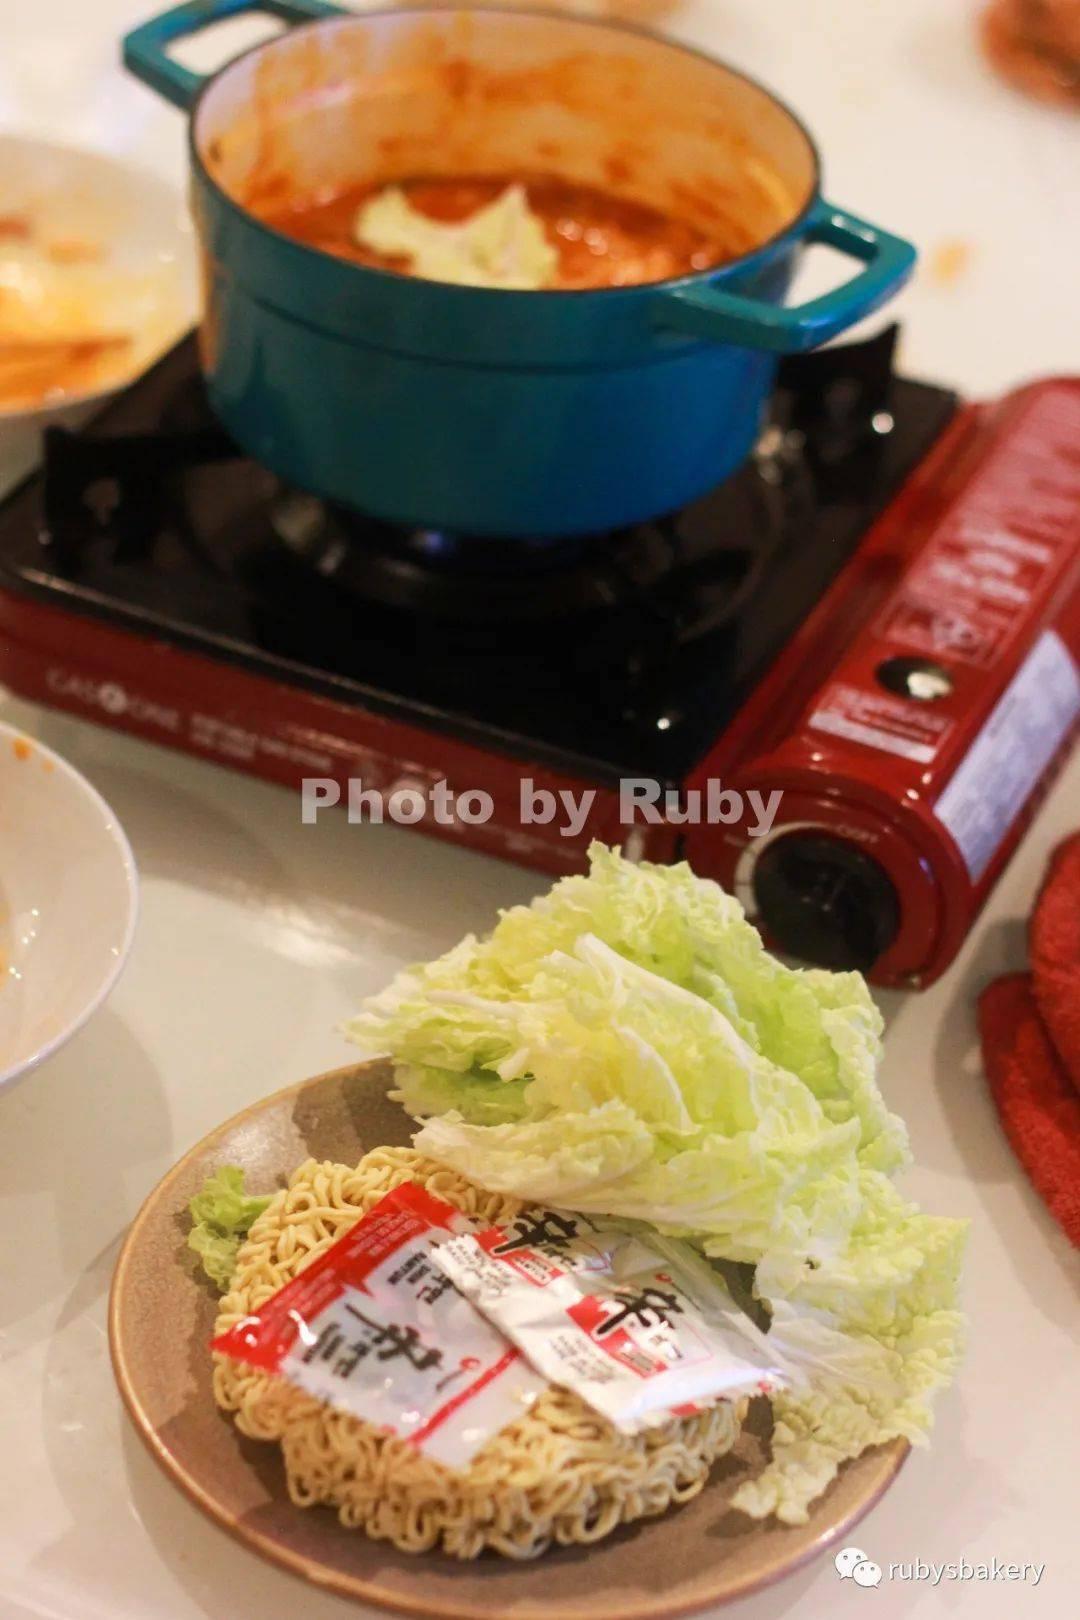 158.『Ruby美食』20分钟快手餐~韩式部队锅